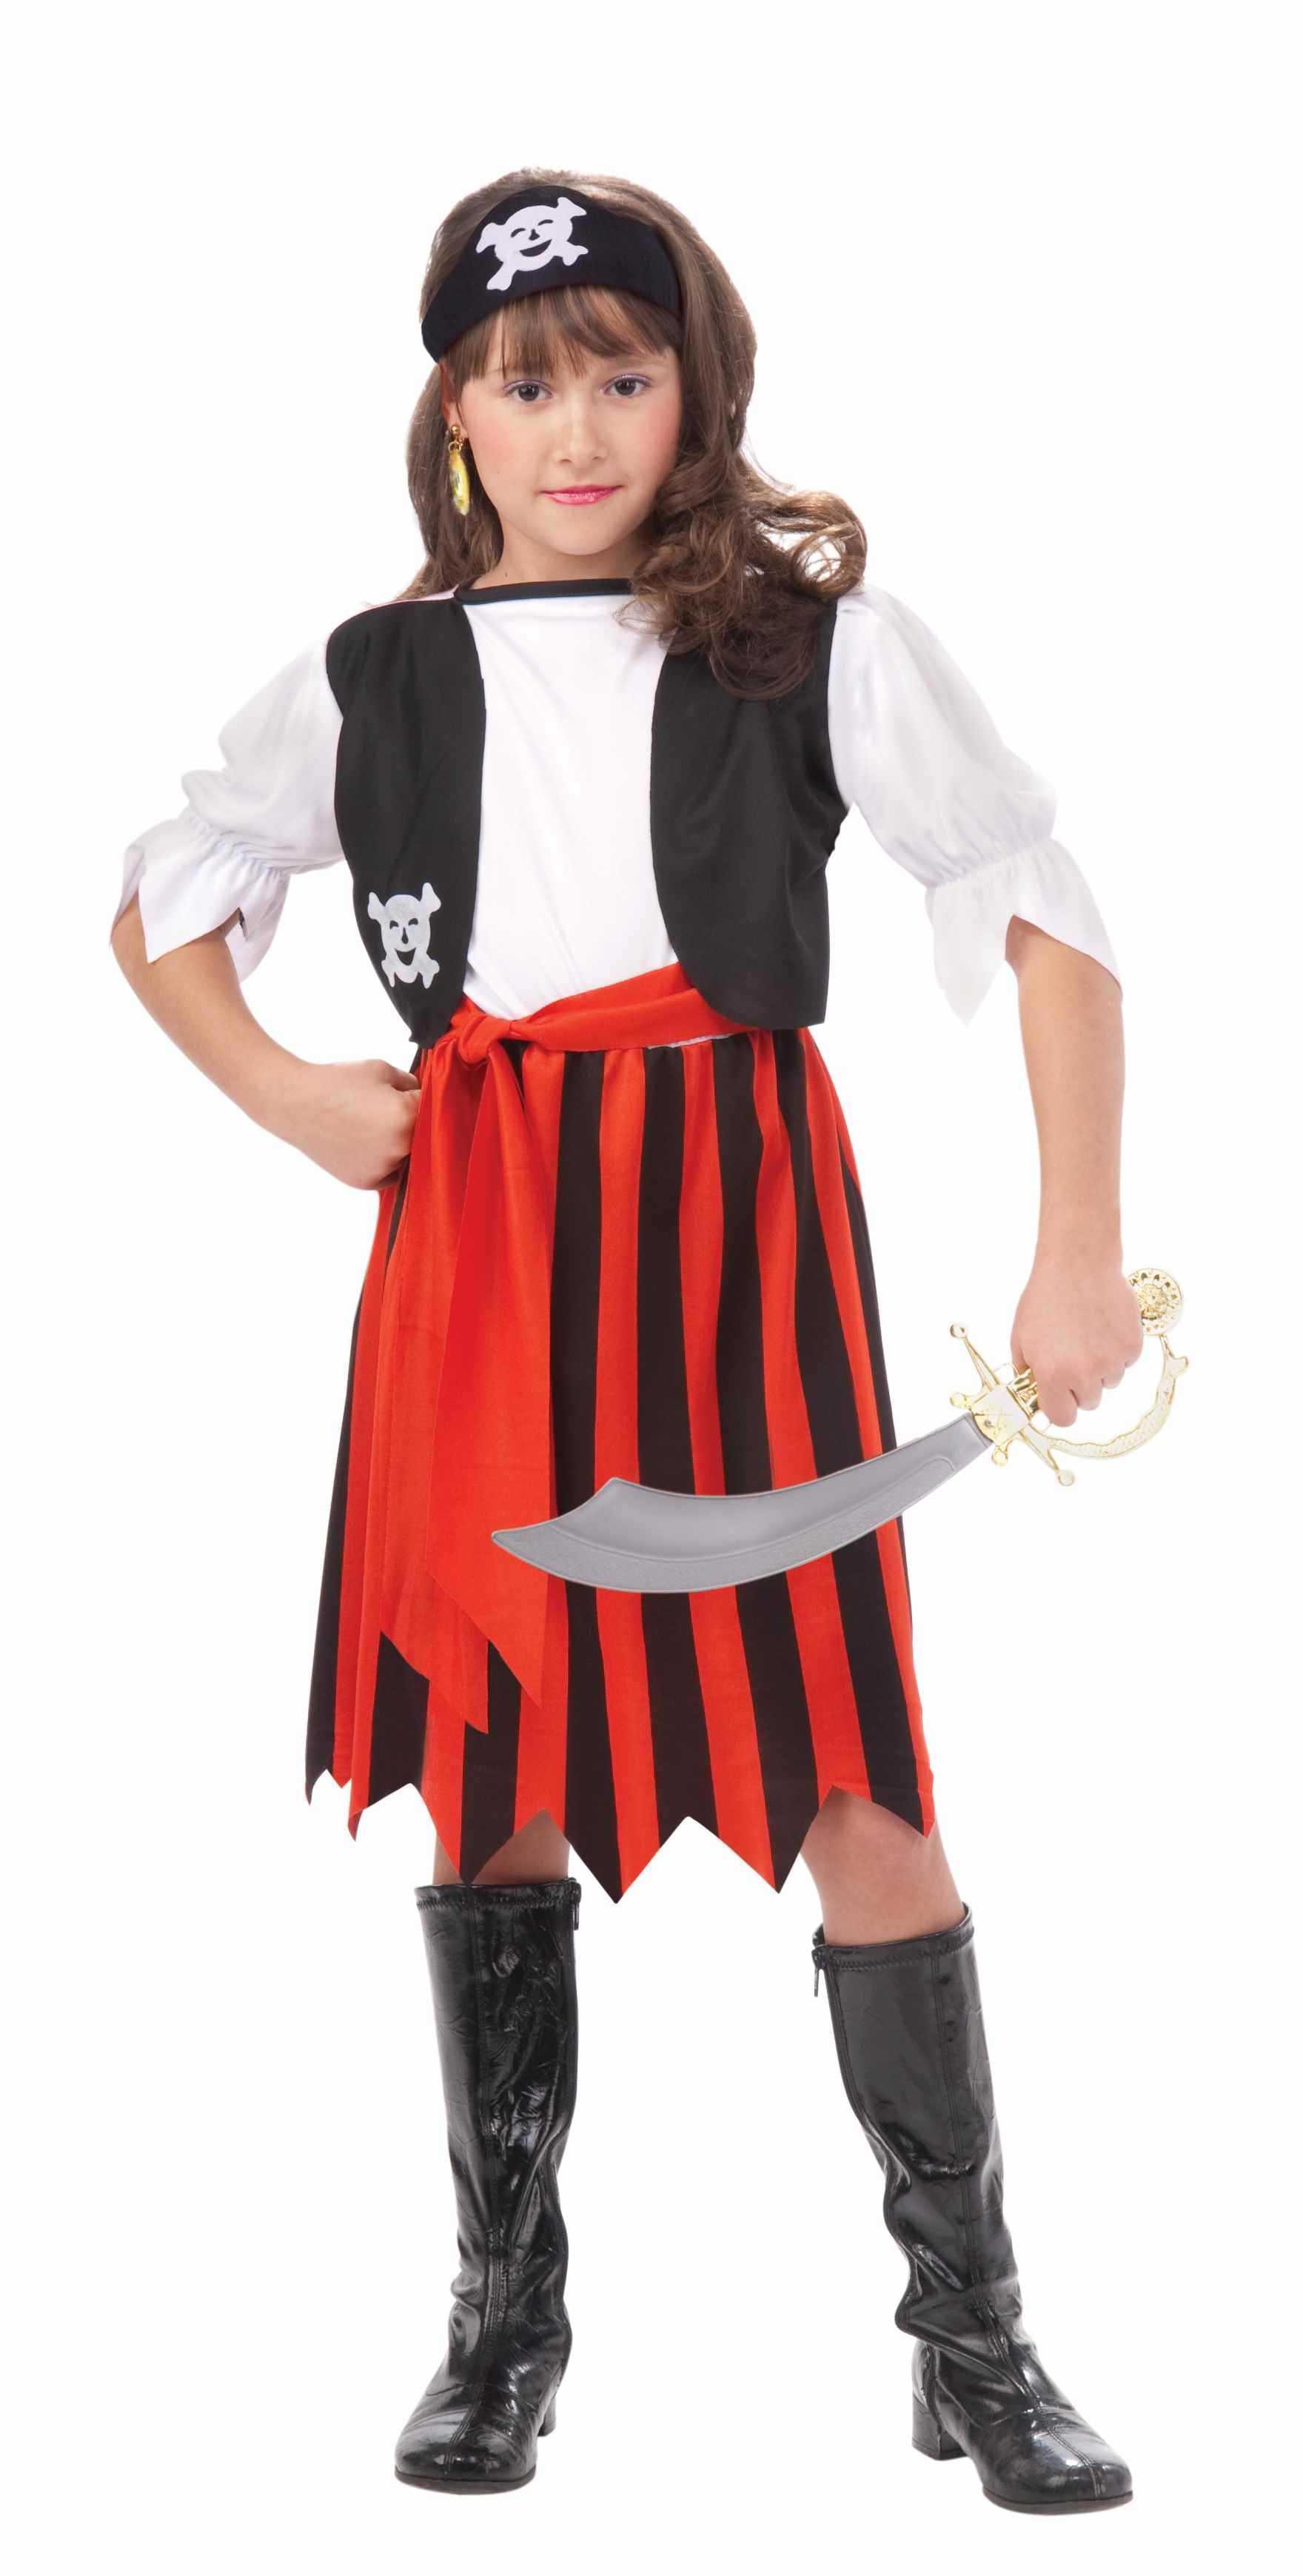 Костюм пирата для девочки своими руками картинки